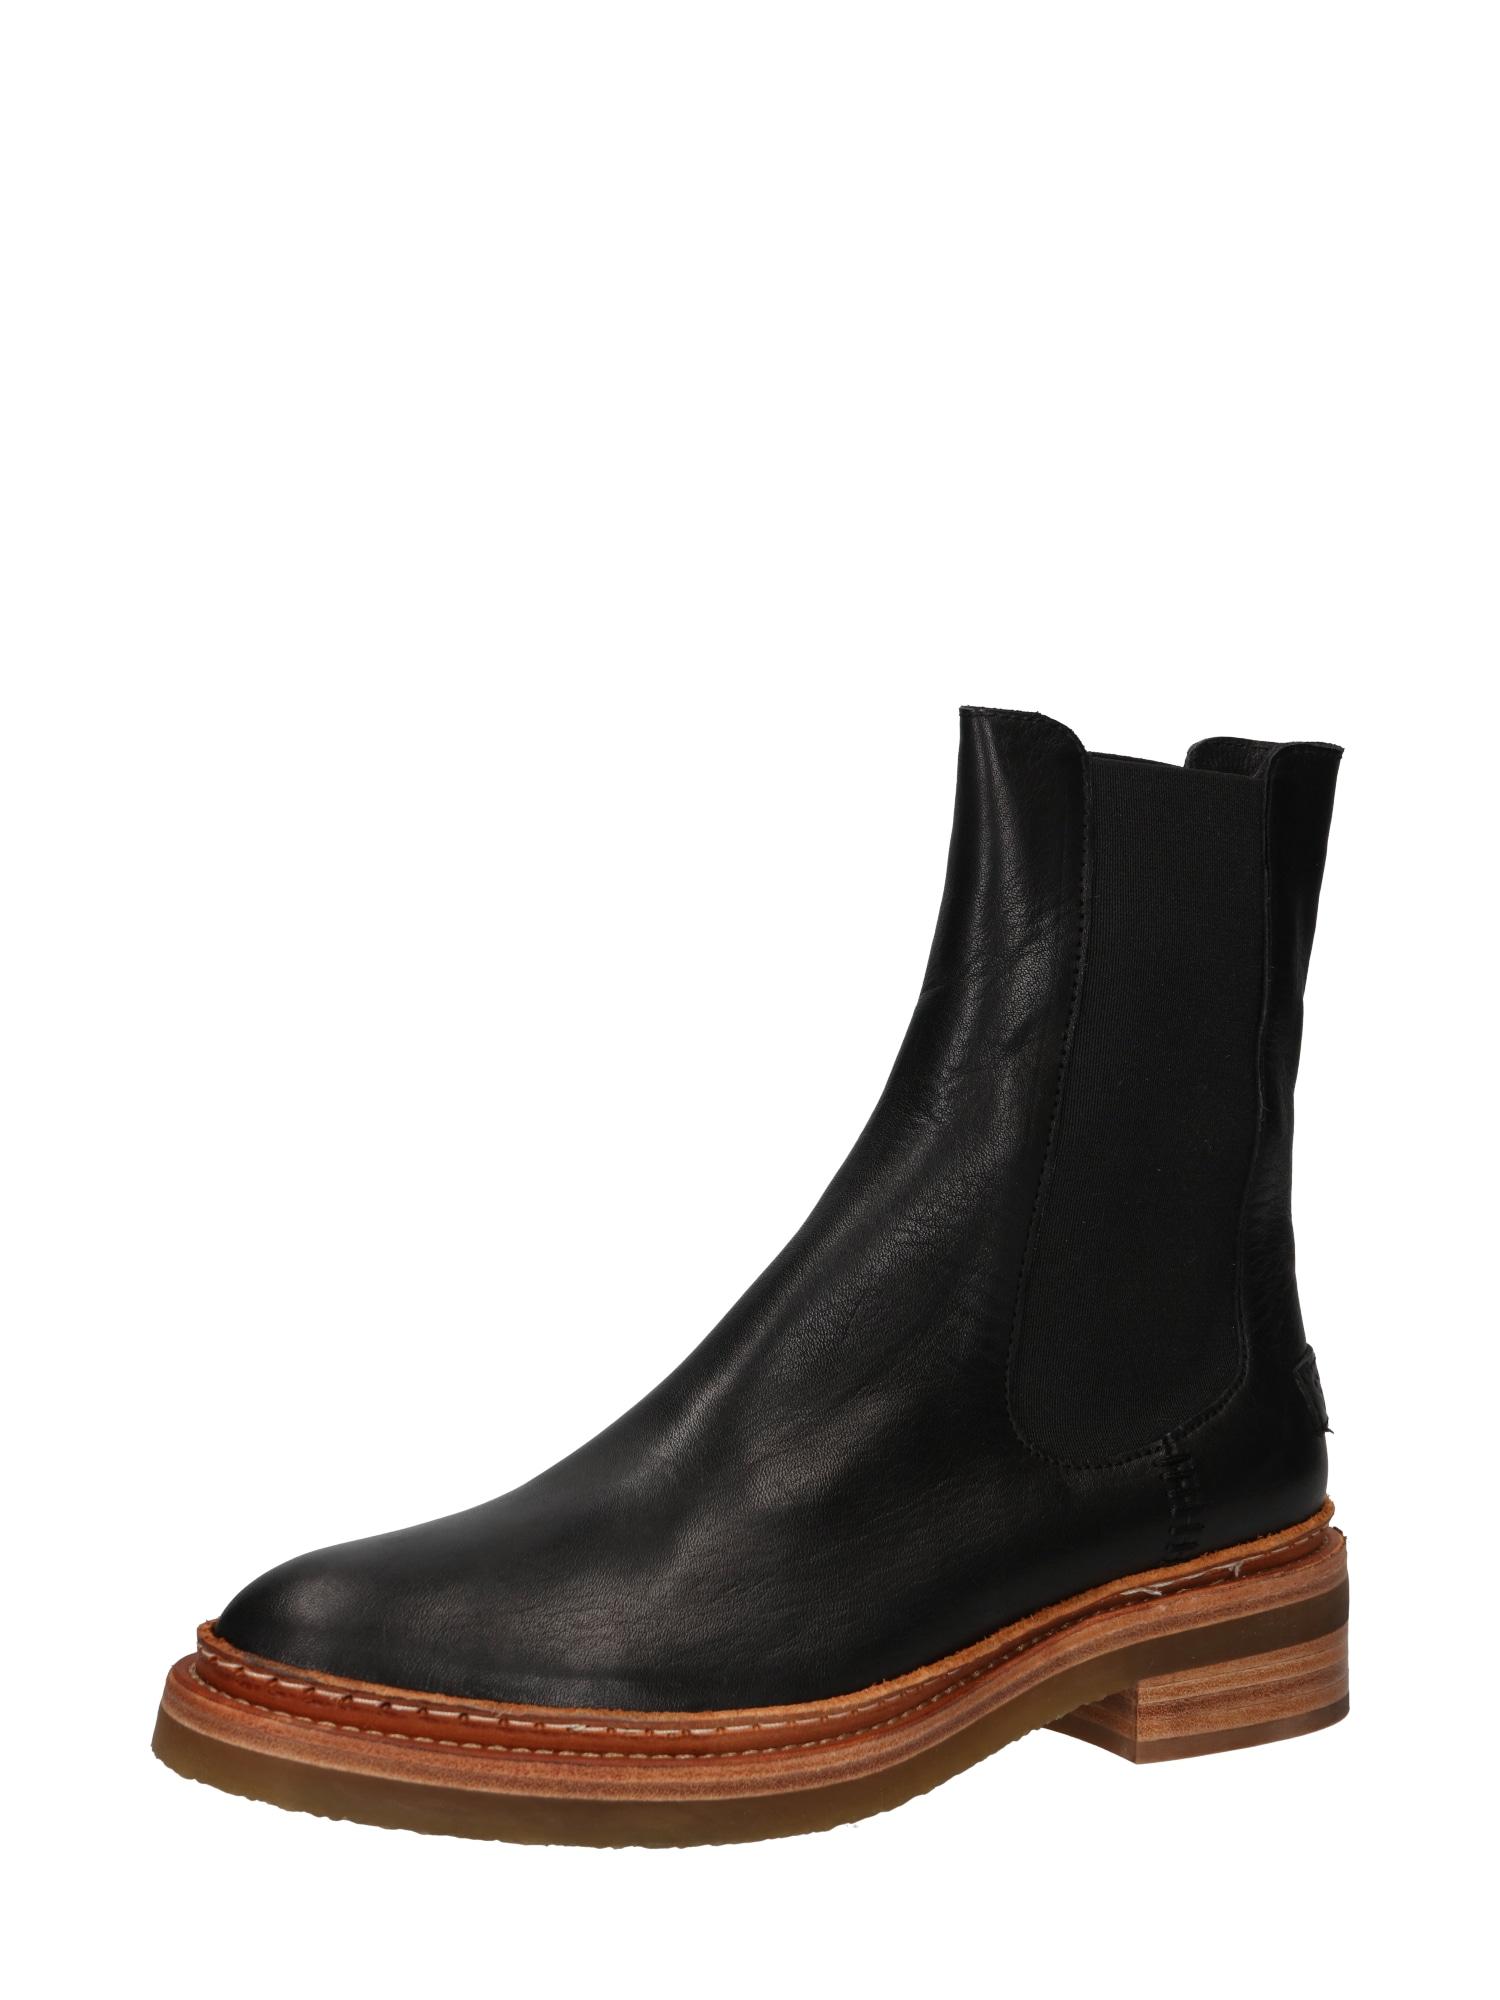 SHABBIES AMSTERDAM Chelsea boty  černá / karamelová